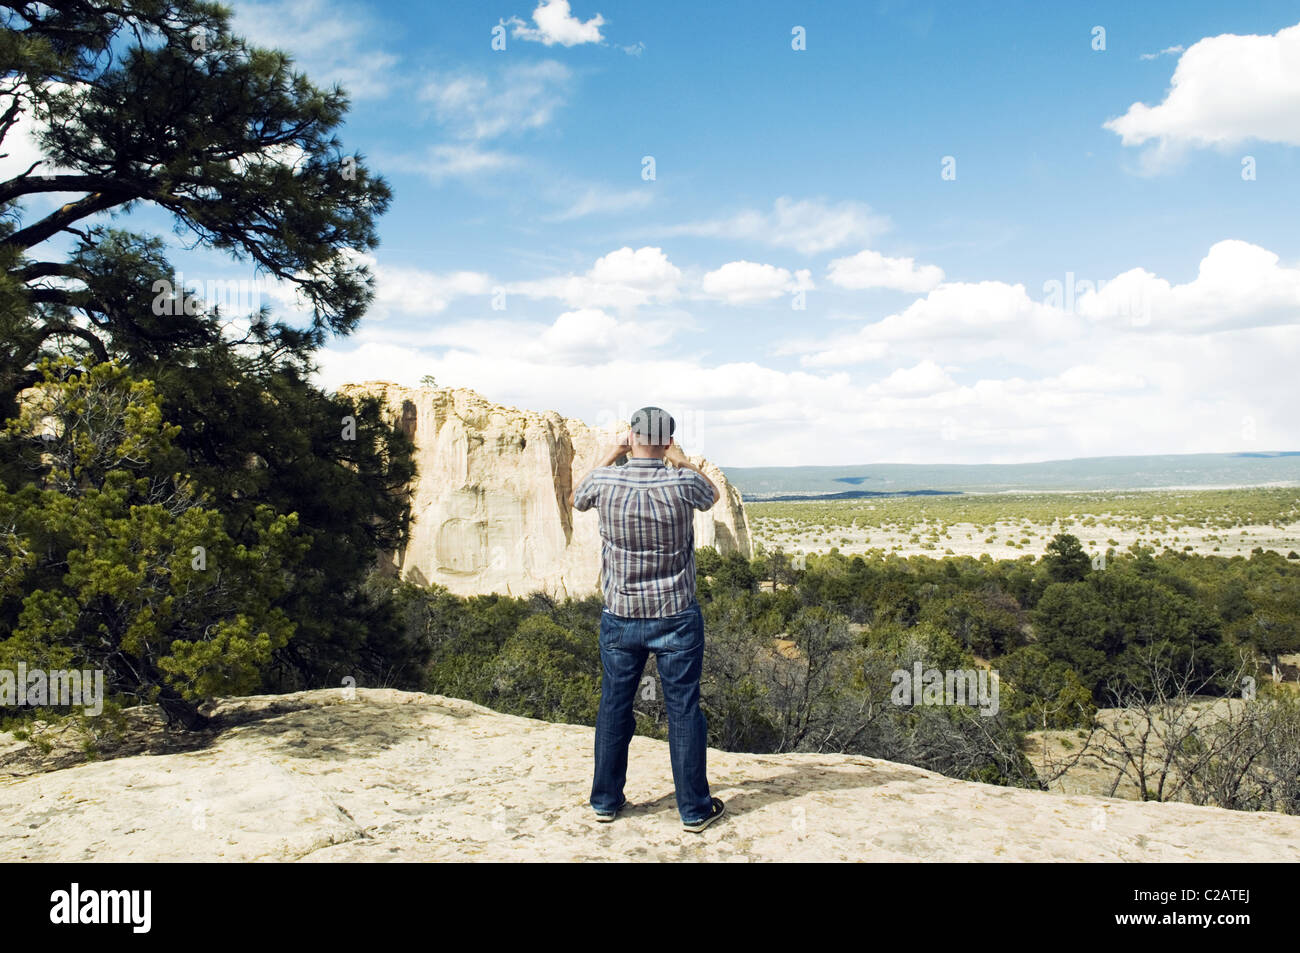 Touristen fotografieren El Morro National Monument, New Mexico, USA Stockbild